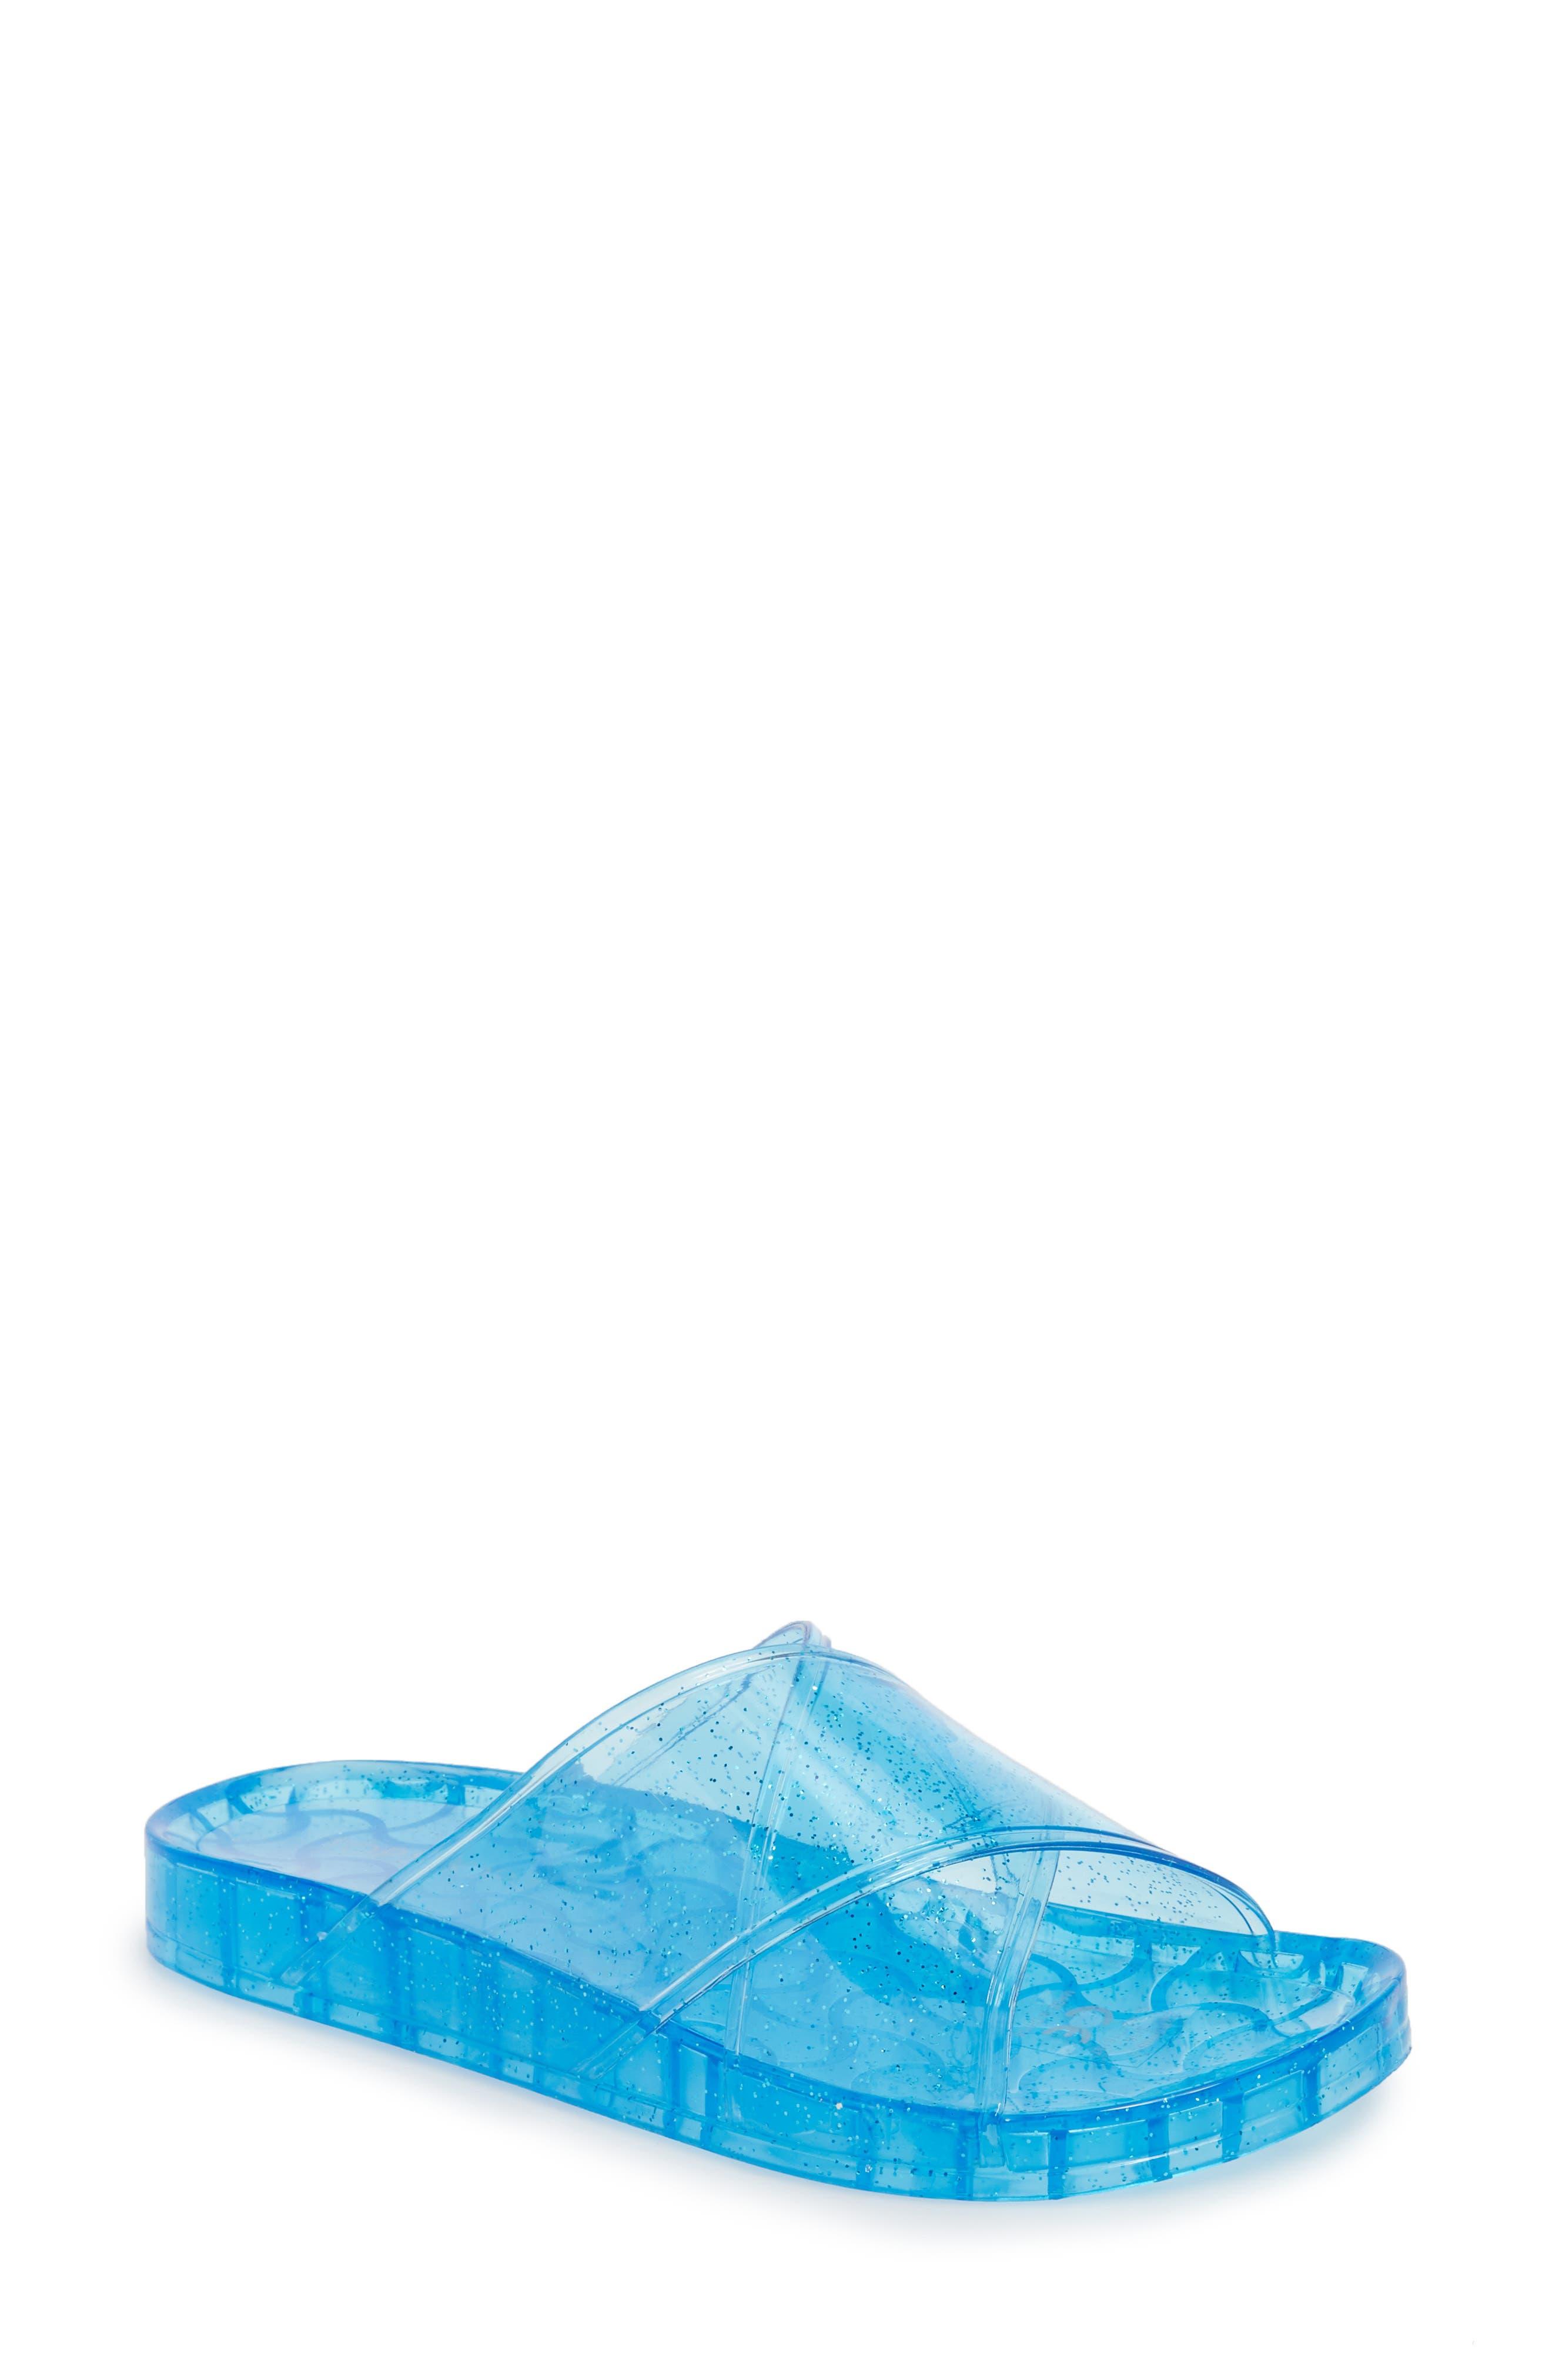 Roxy Jelly Slide Sandal,                             Main thumbnail 1, color,                             Blue